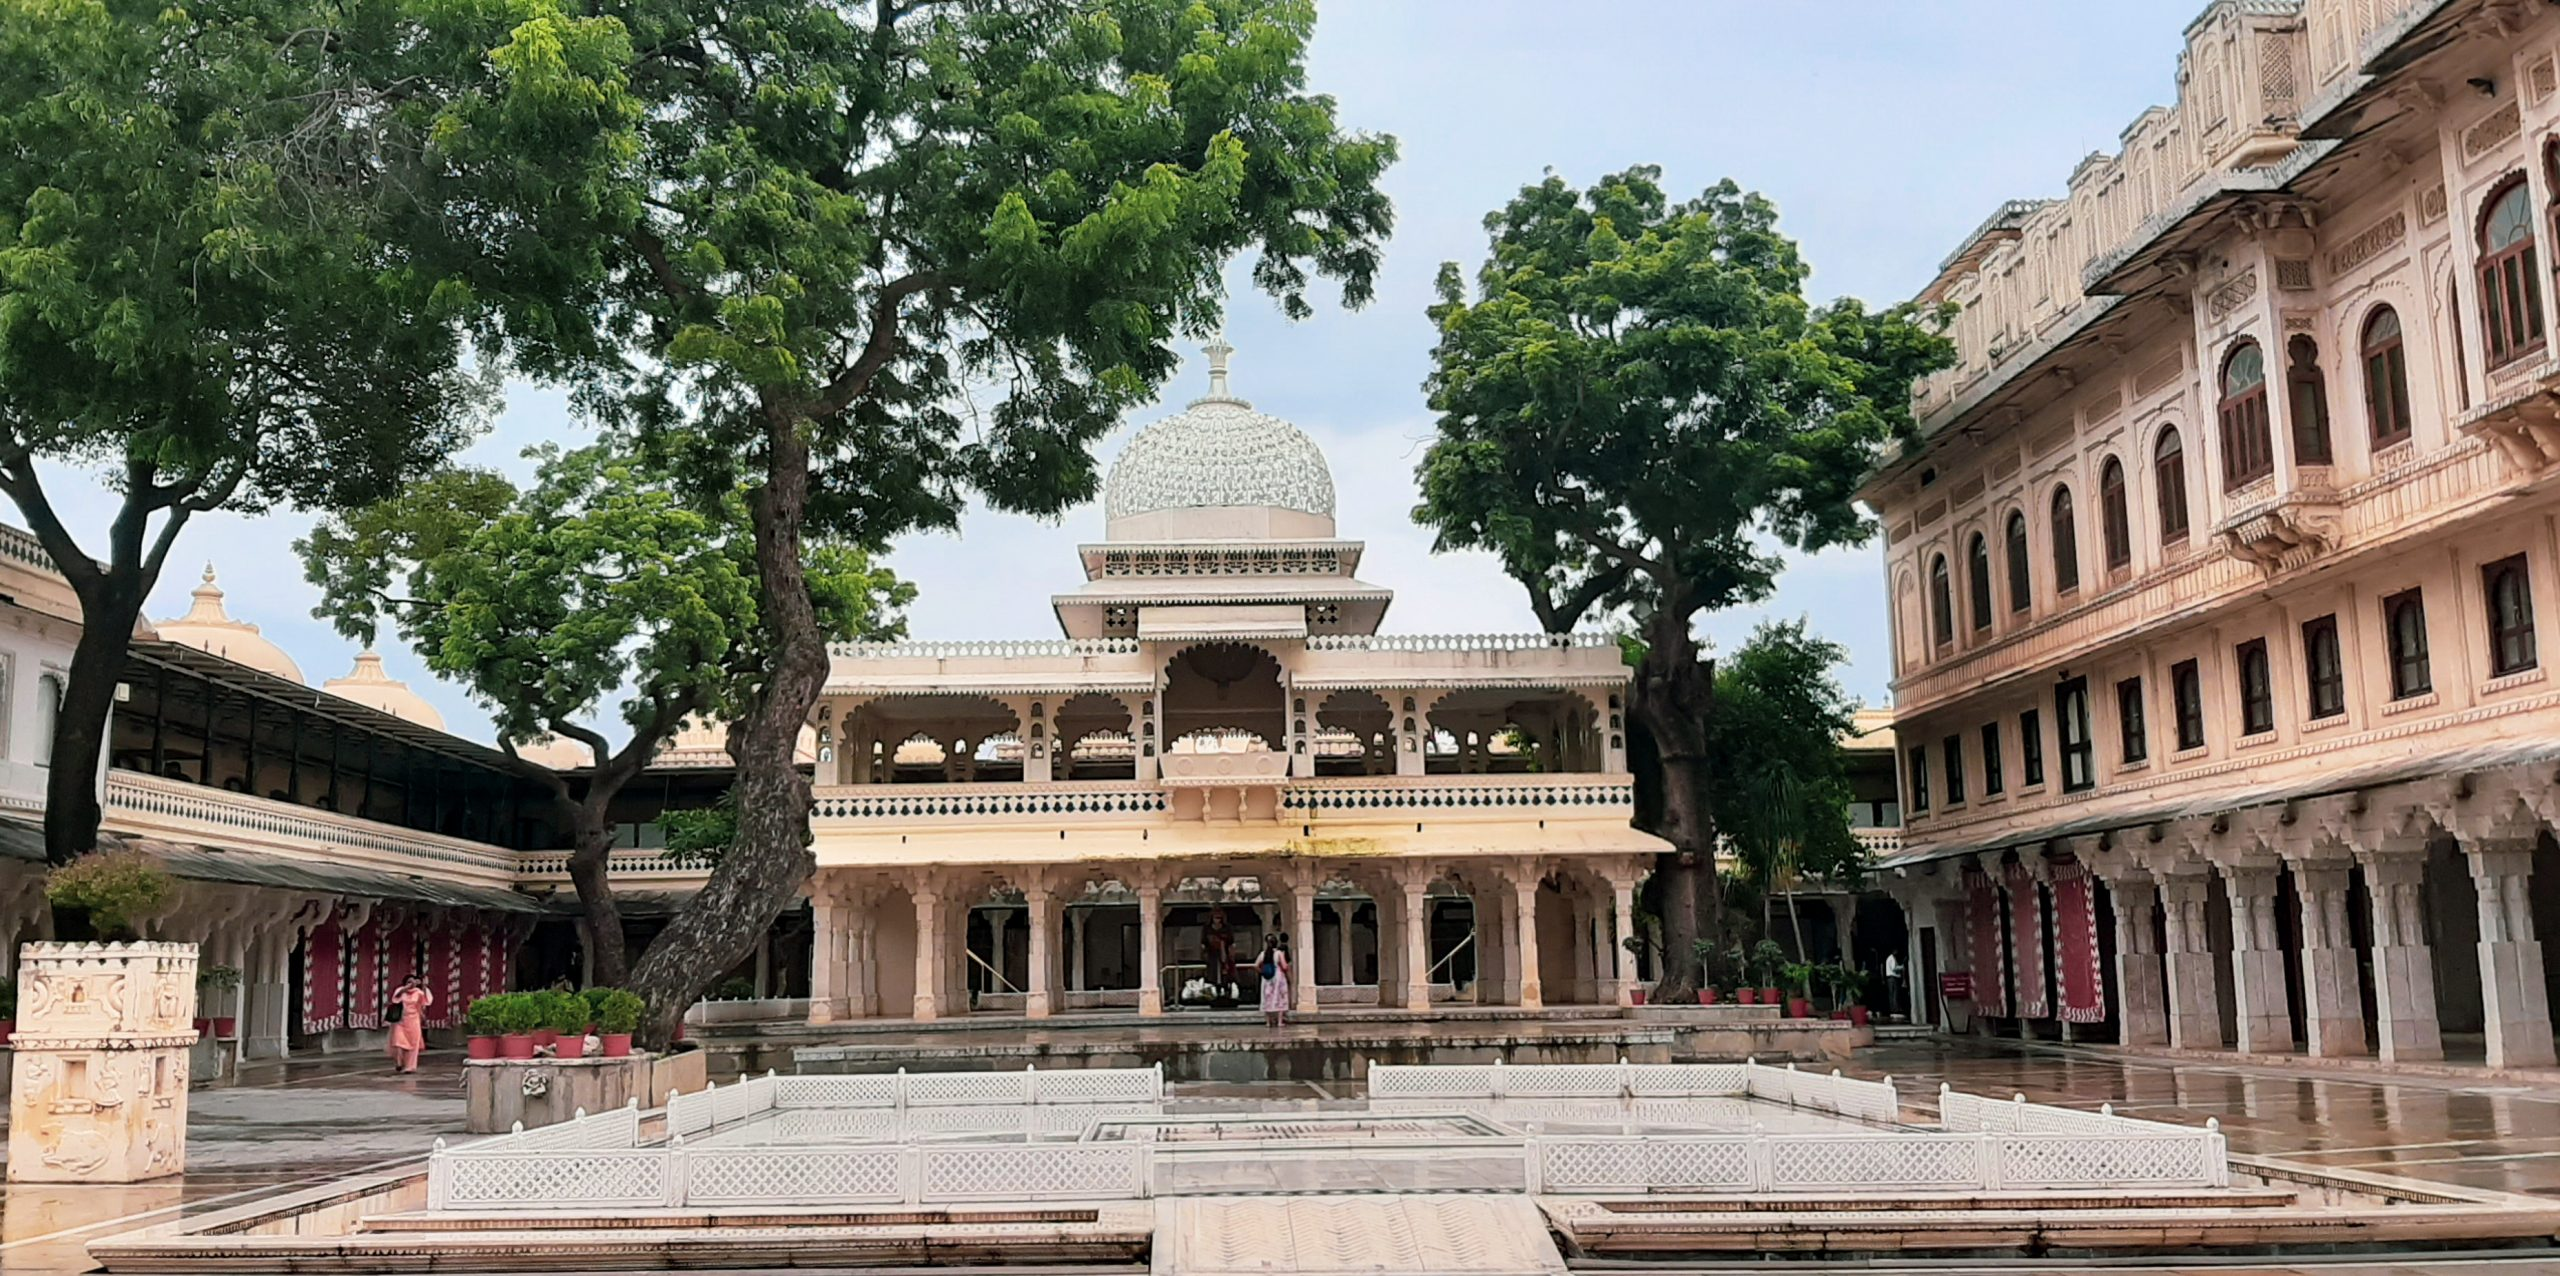 Hindu Temple in Udaipur